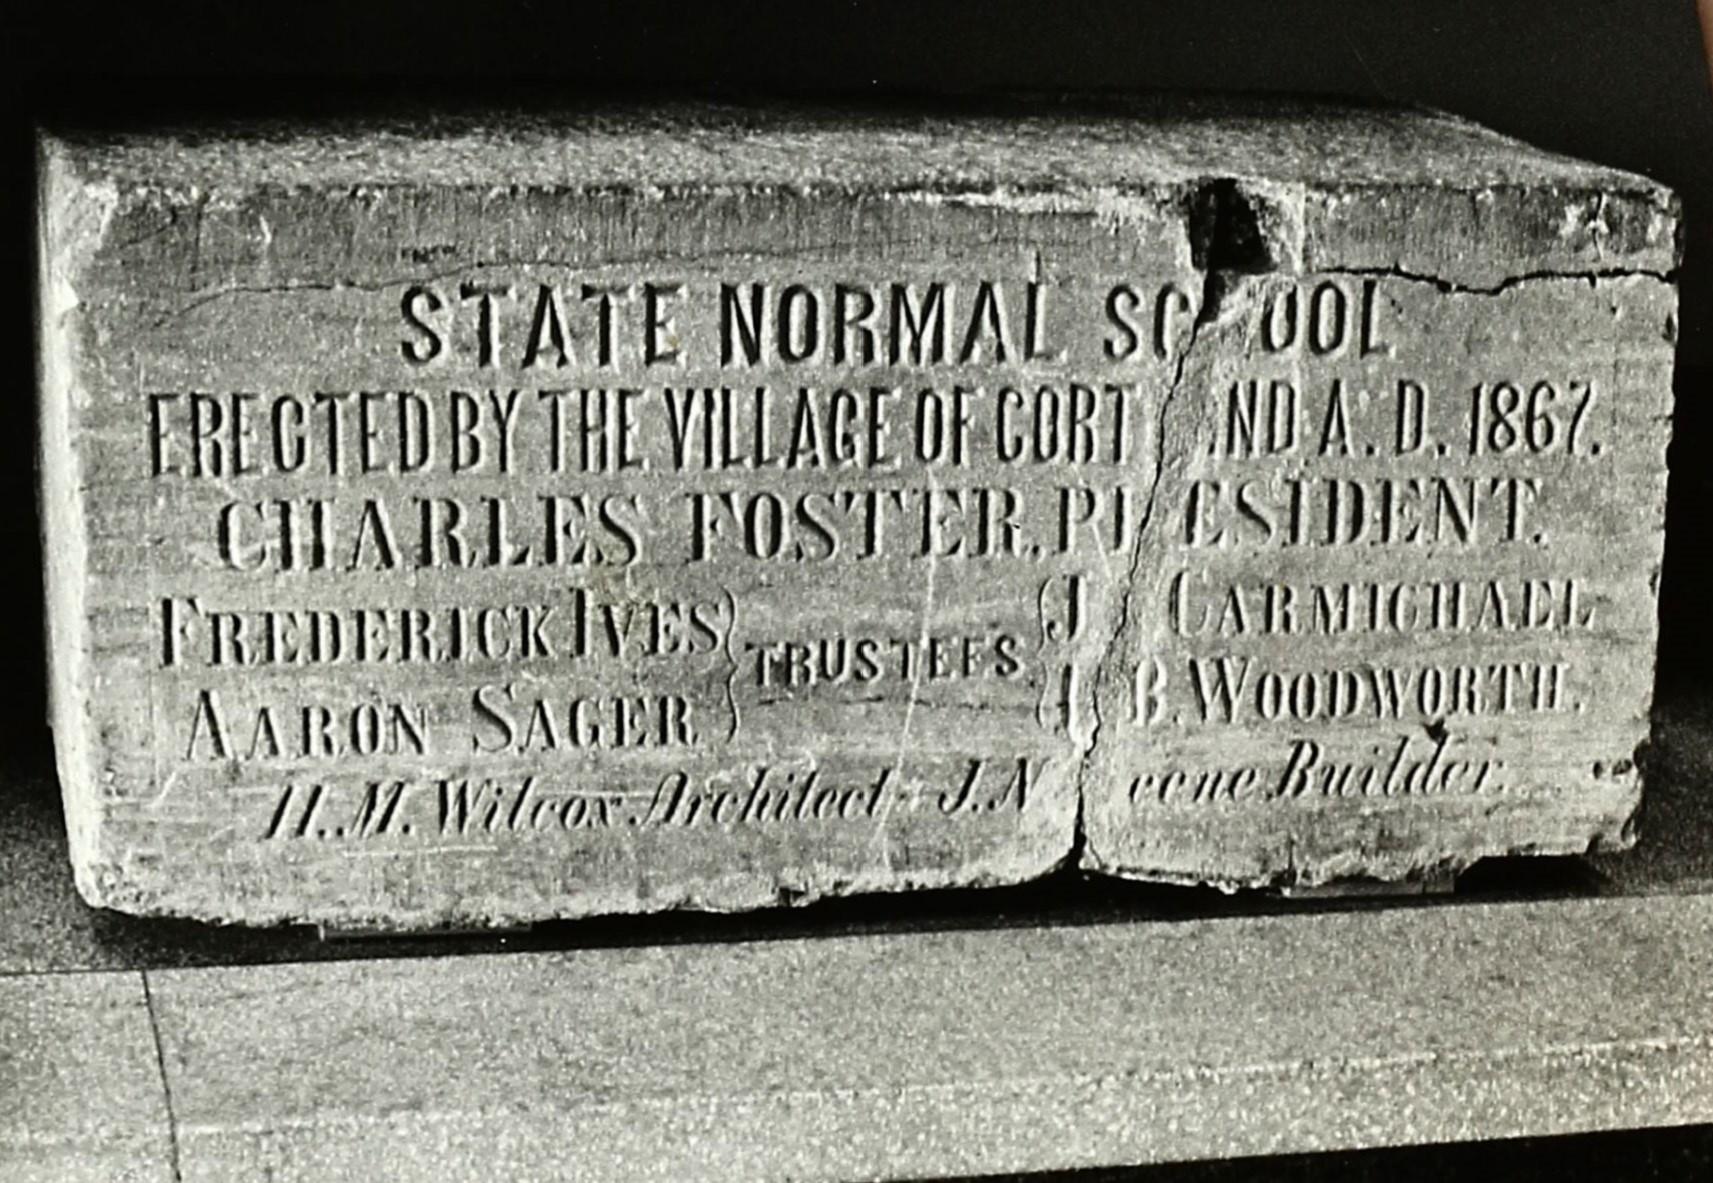 Dedication of Original Cornerstone